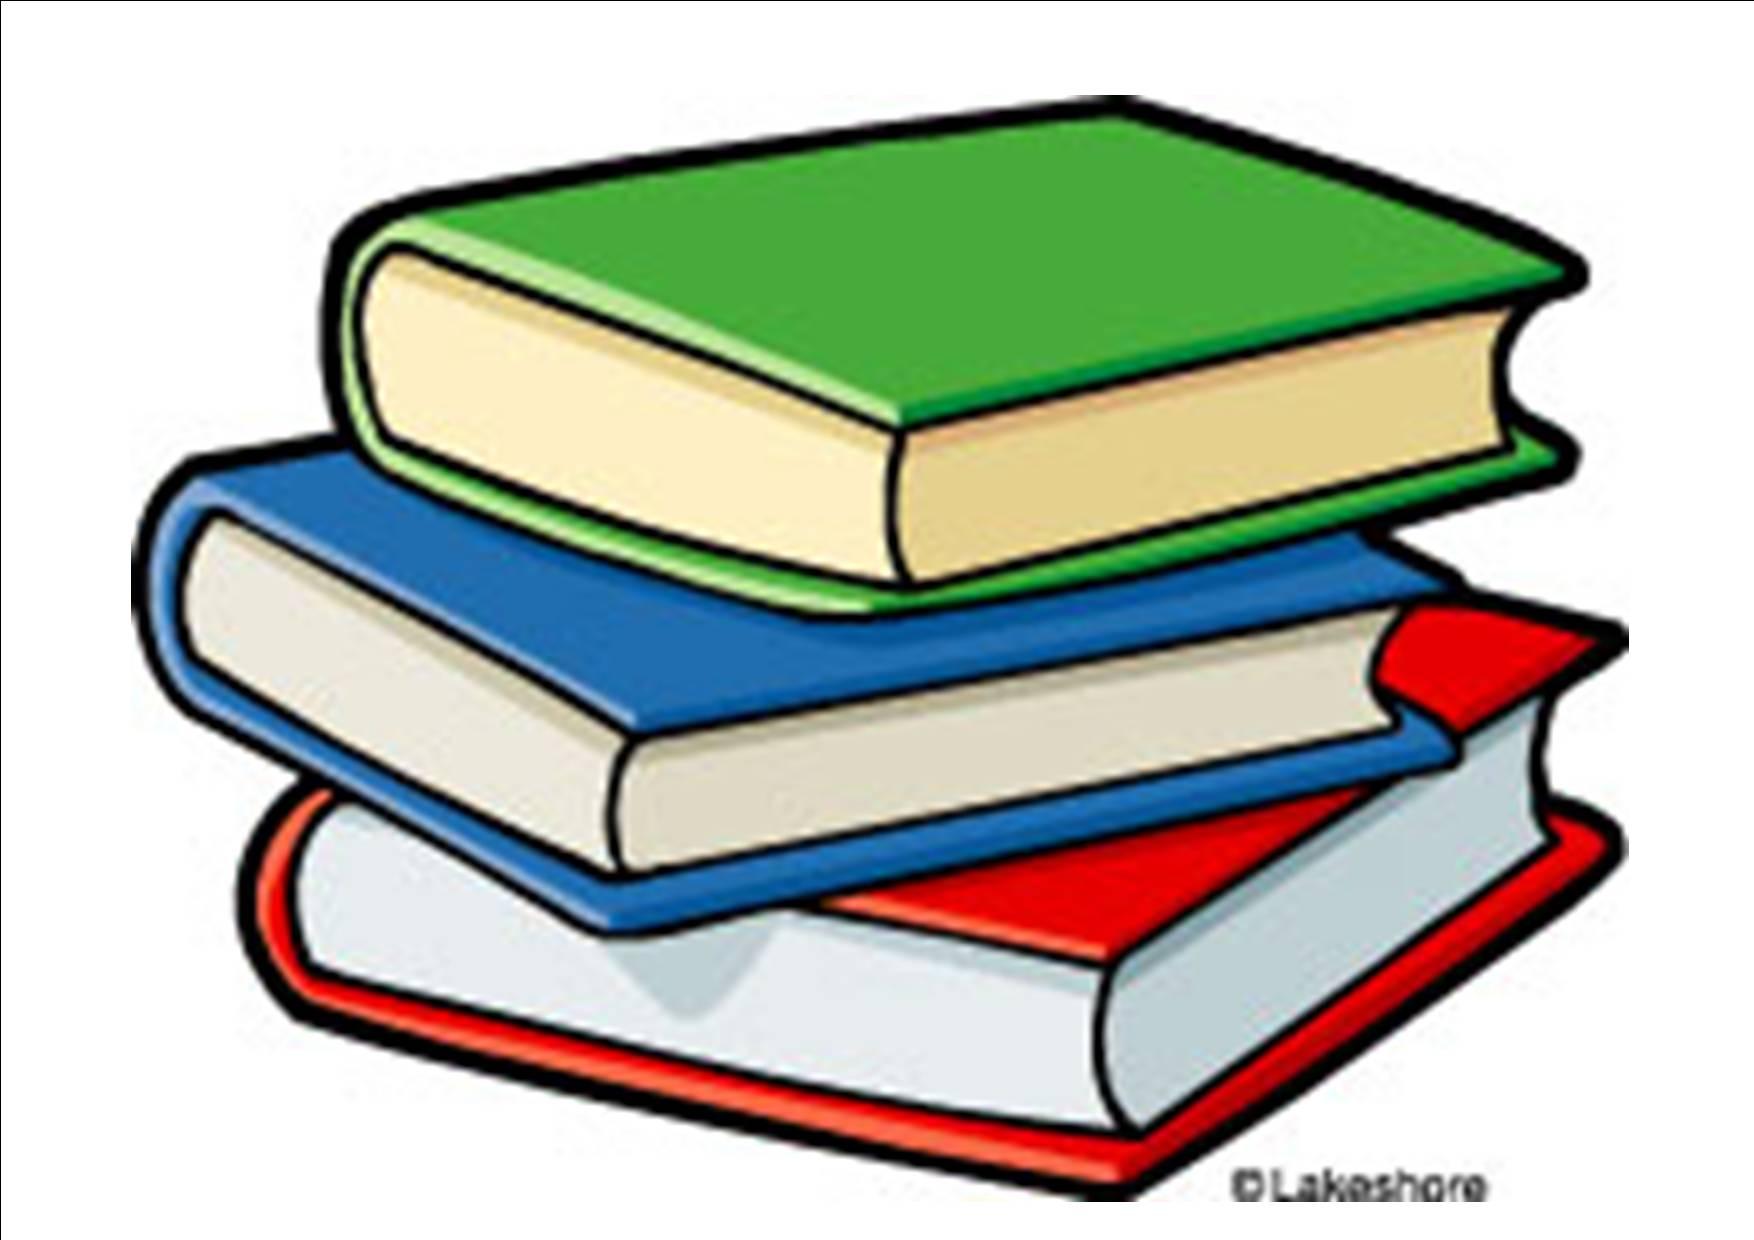 Book Clip Art: 10 reading boo - Book Clipart